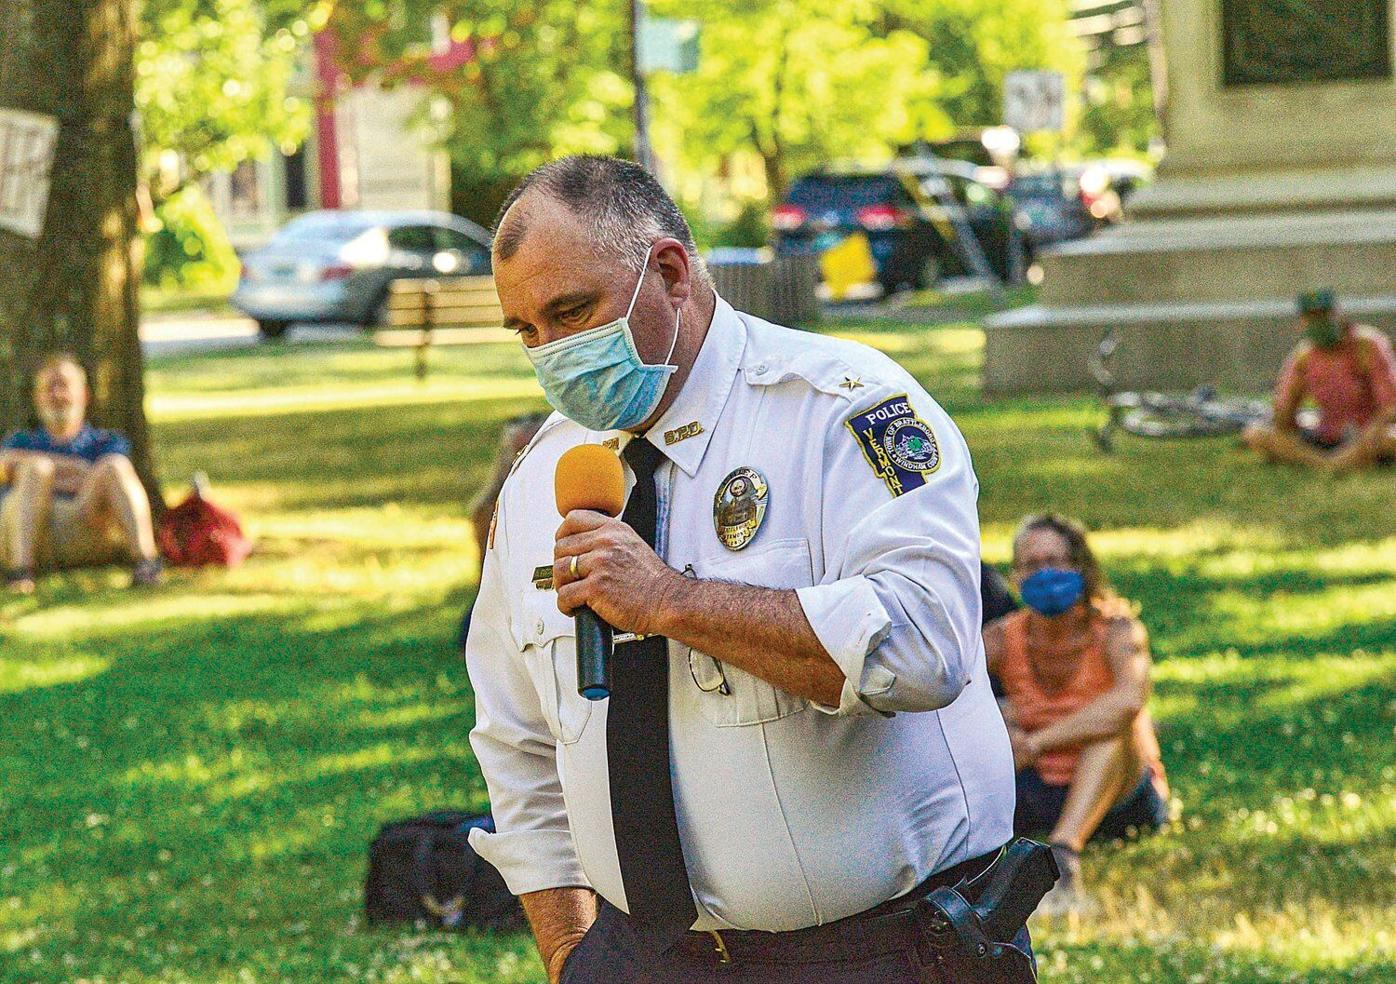 Brattleboro Police Department chief announces retirement